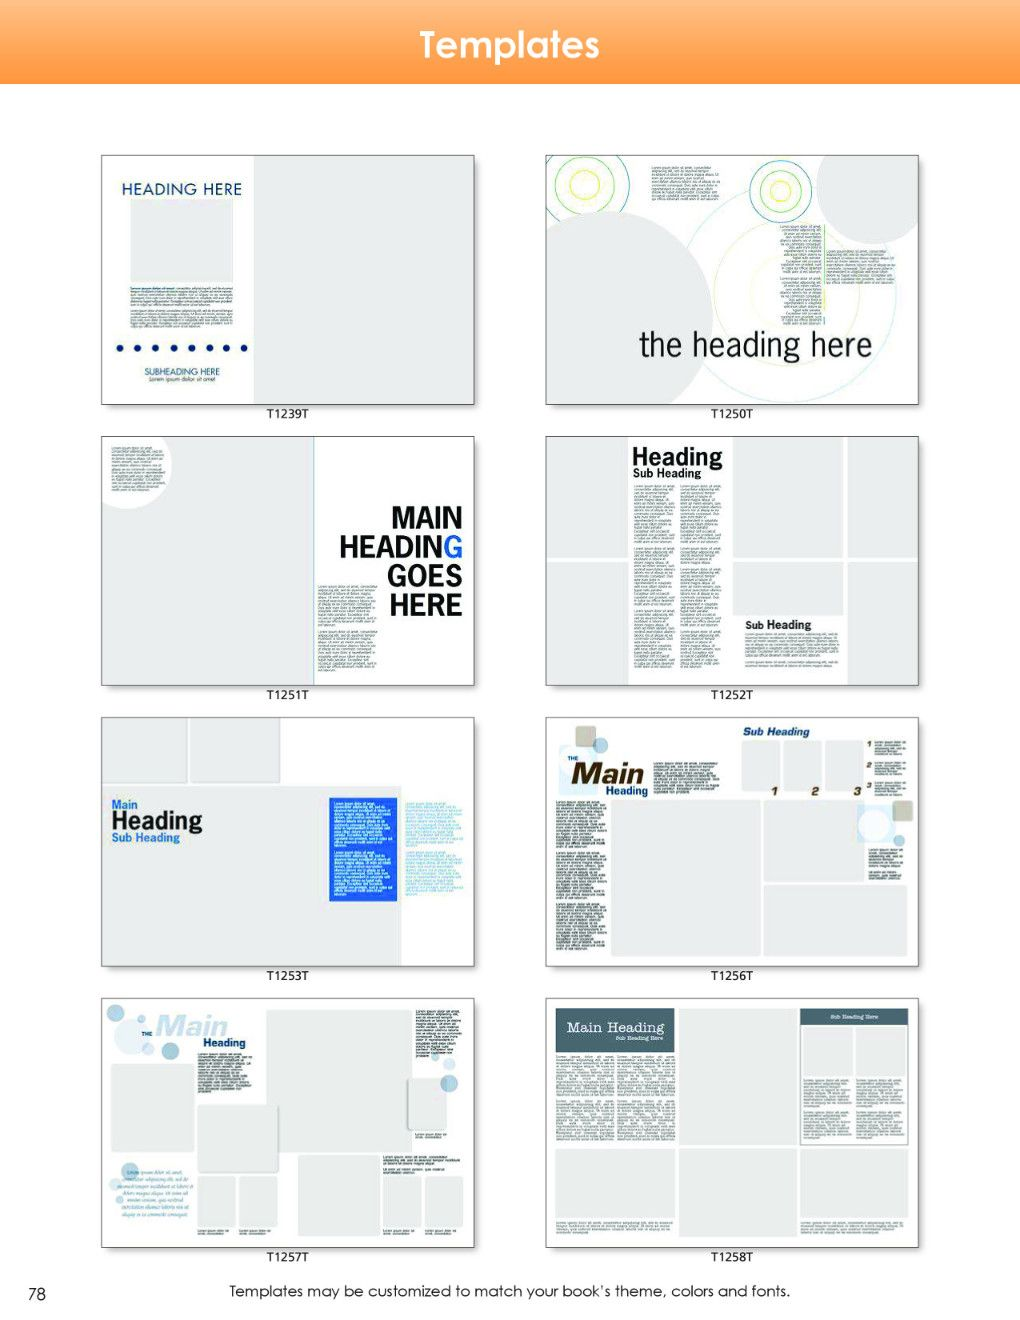 Clipart Backgrounds Templates Fonts YearbookLife Yearbook - Yearbook design templates